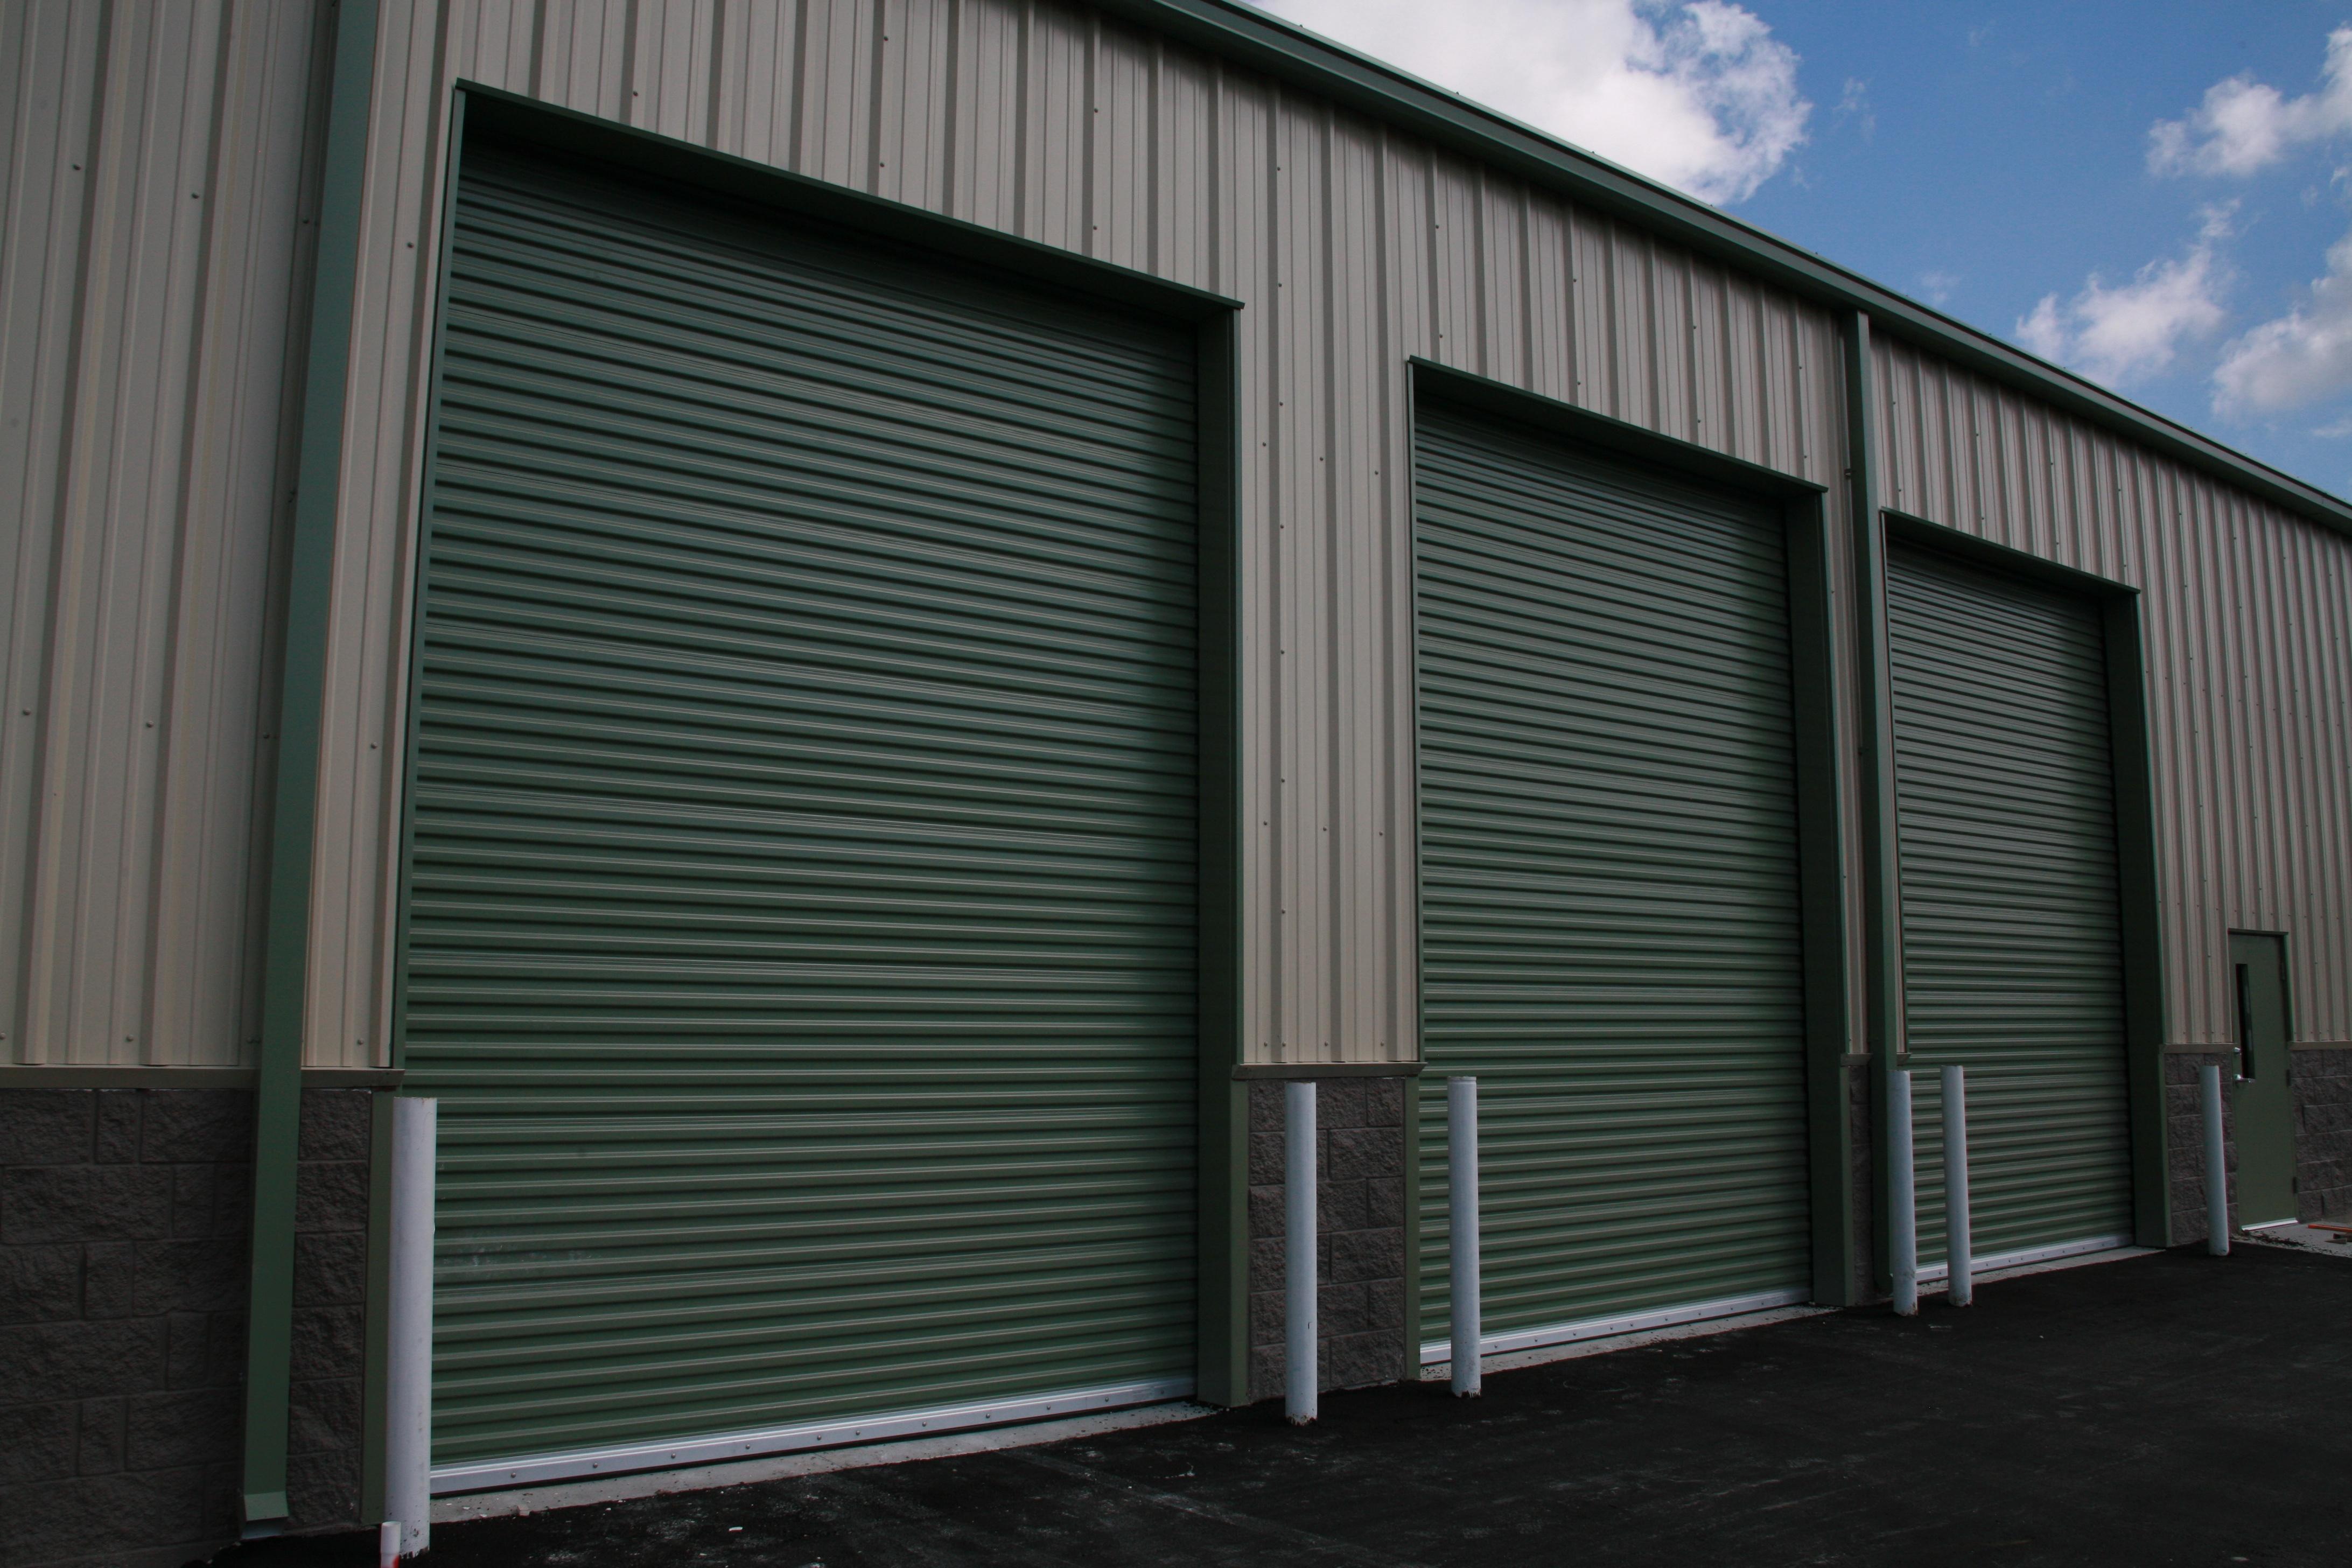 Green commercial roll up doors